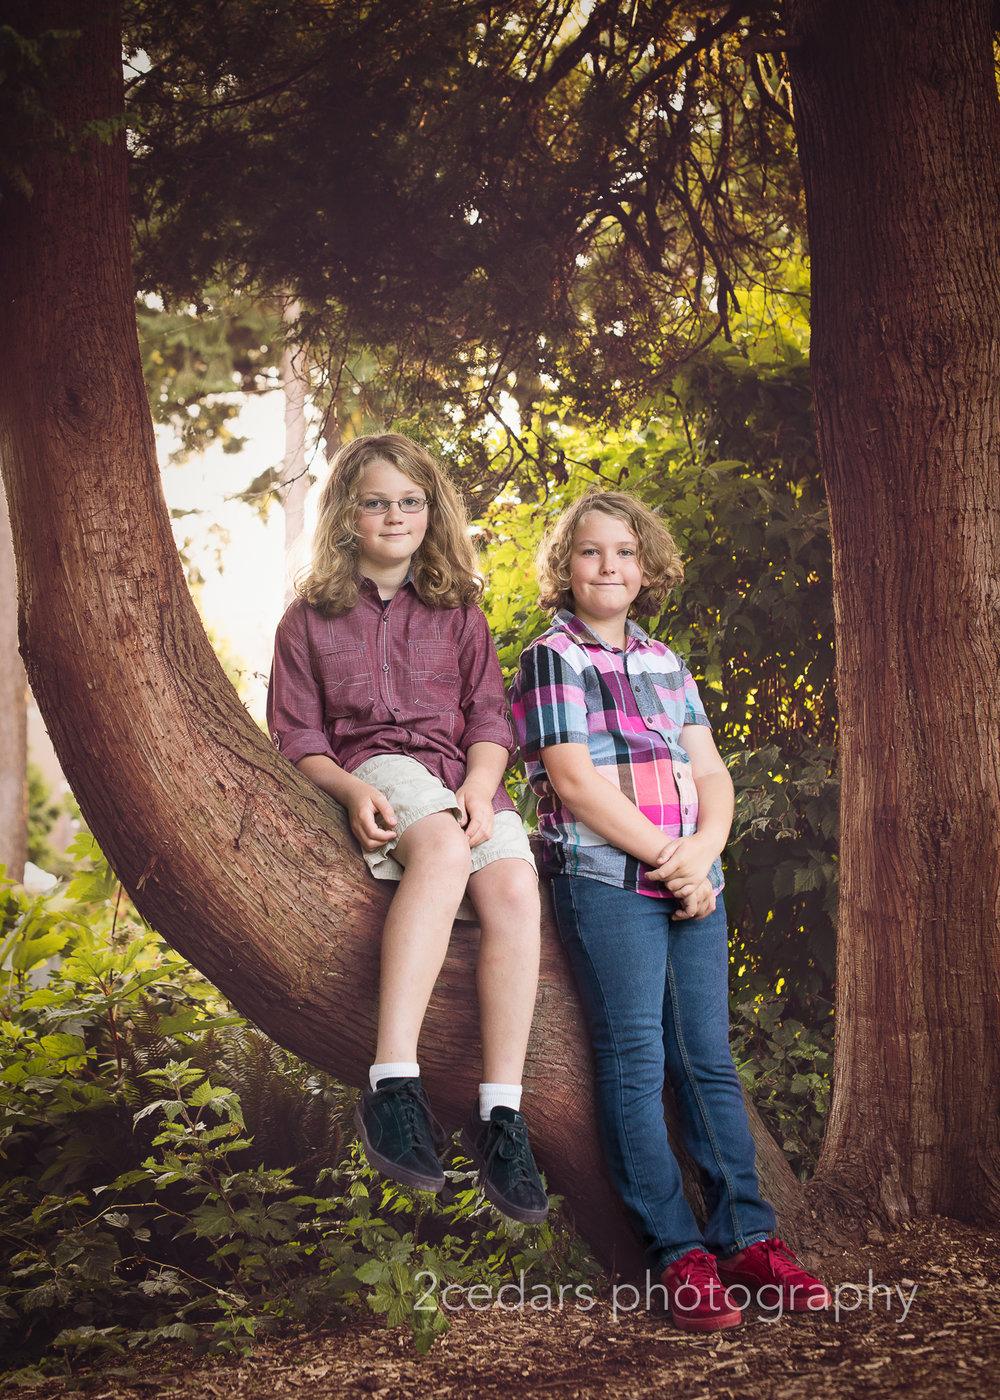 2cedarsphoto-Sullivan-Family-Web--3.jpg